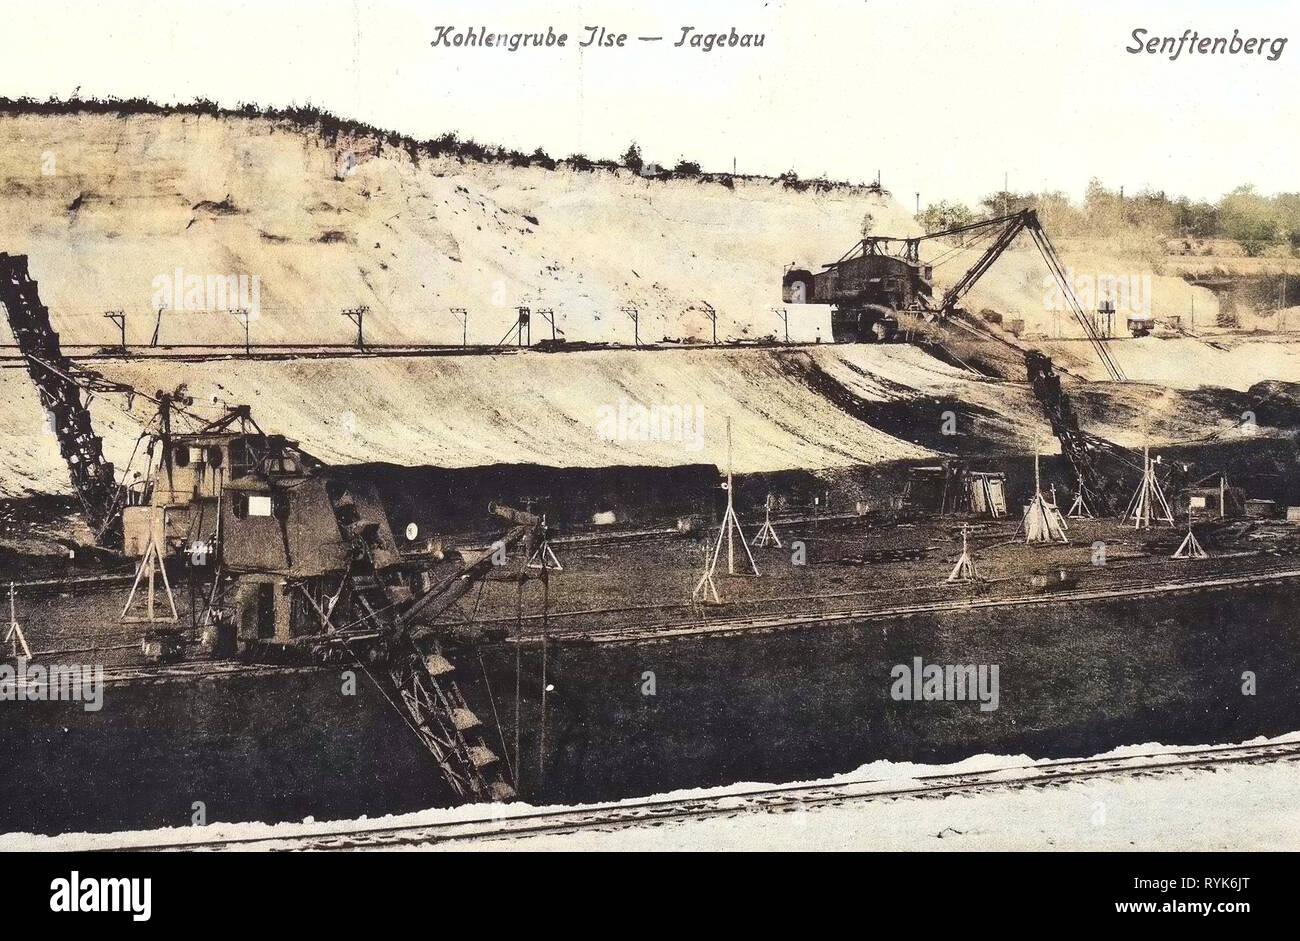 Open pit mining in Germany, Ilse Bergbau AG, Chain-and-bucket excavators, 1918, Brandenburg, Senftenberg, Kohlengrube Ilse, Tagebau - Stock Image